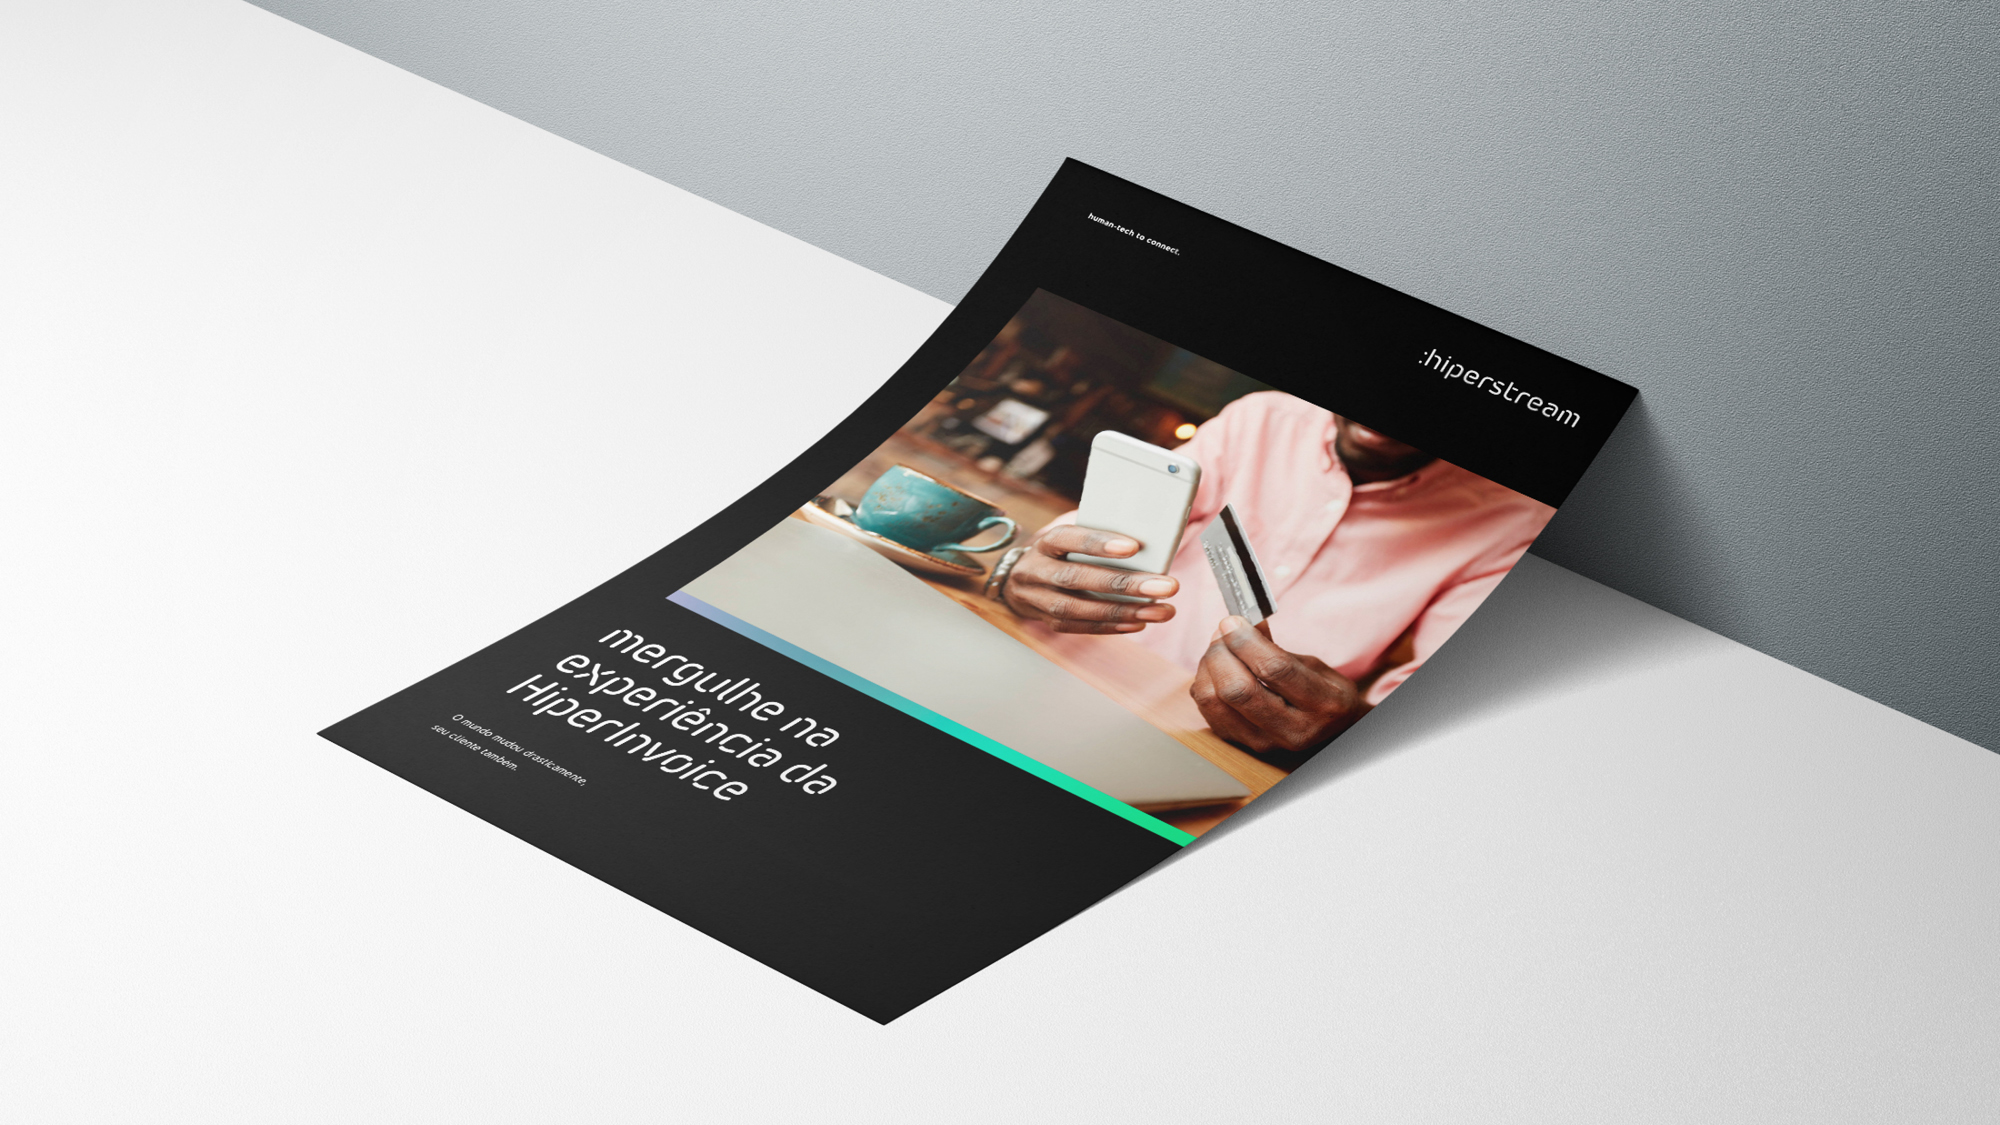 Lanatta-Branding-and-Design-Hiperstream14